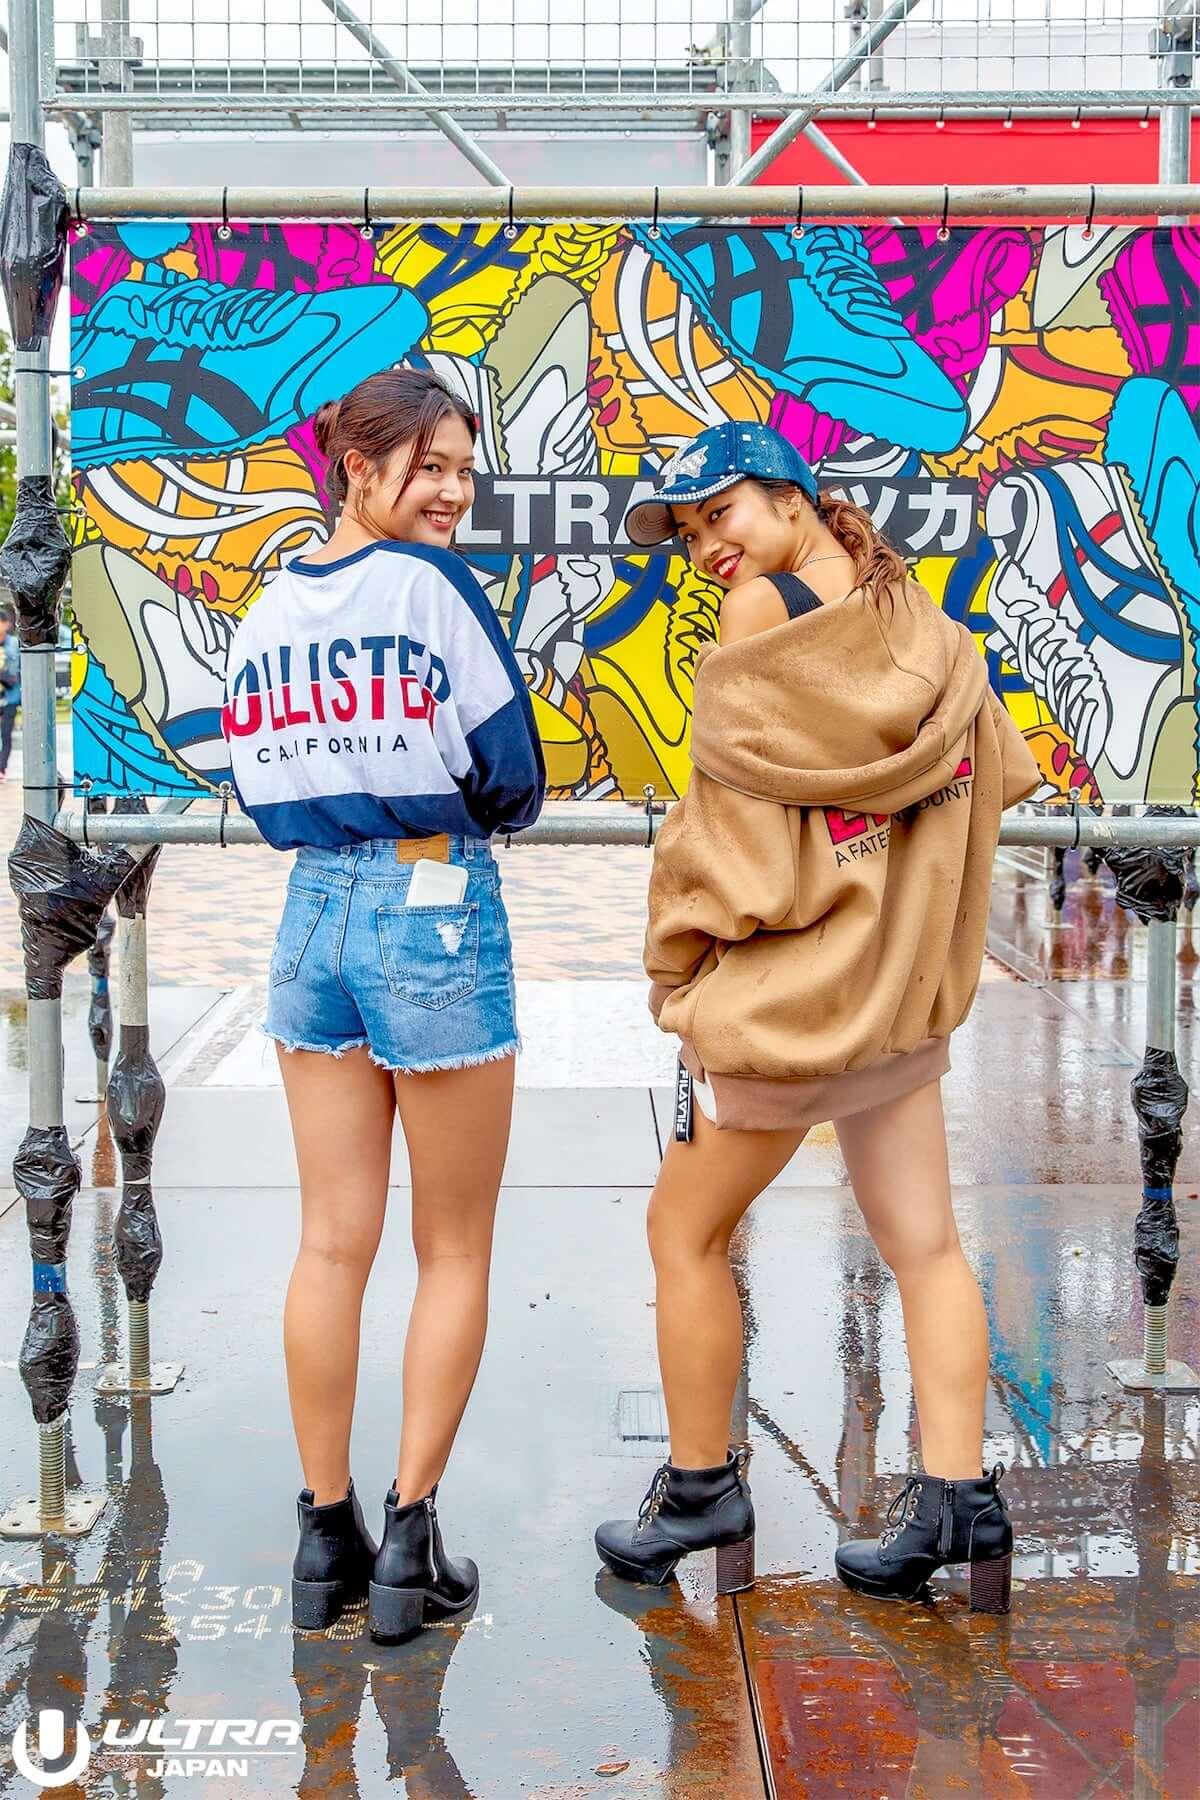 ULTRA JAPAN 2018公式ファッションスナップ到着!今年のトレンドはリンクコーデ? music180918_ultrajapan2018_1_3-1200x1800